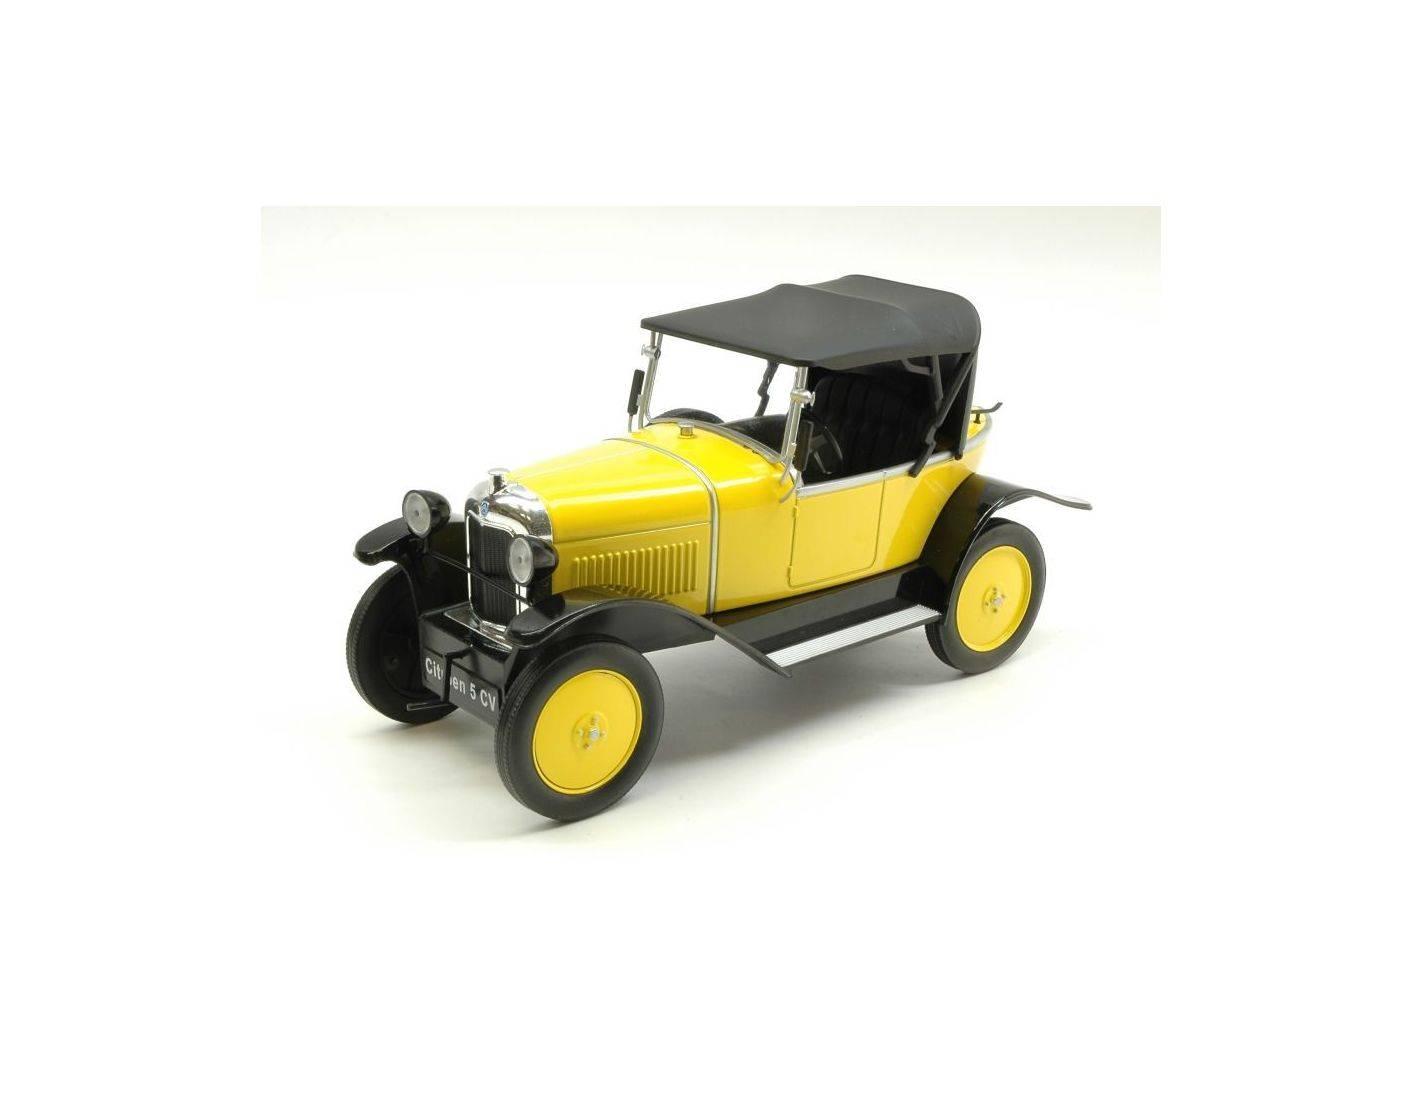 Mac due mcg18052 citroen 5 cv yellow black 1 18 modellino for Mac due the box